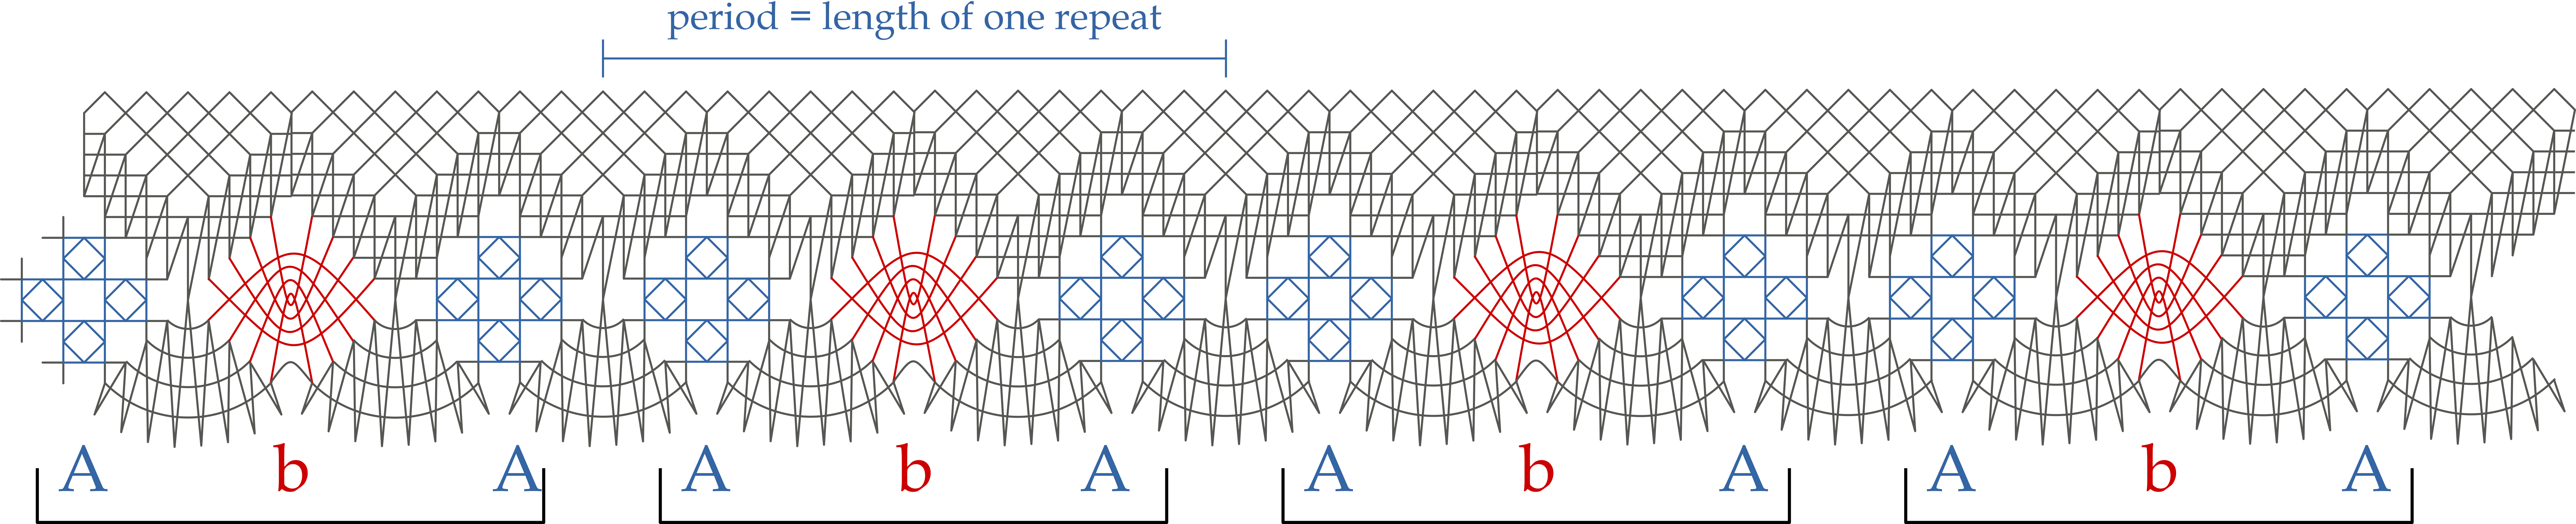 fig1_periodic_frieze